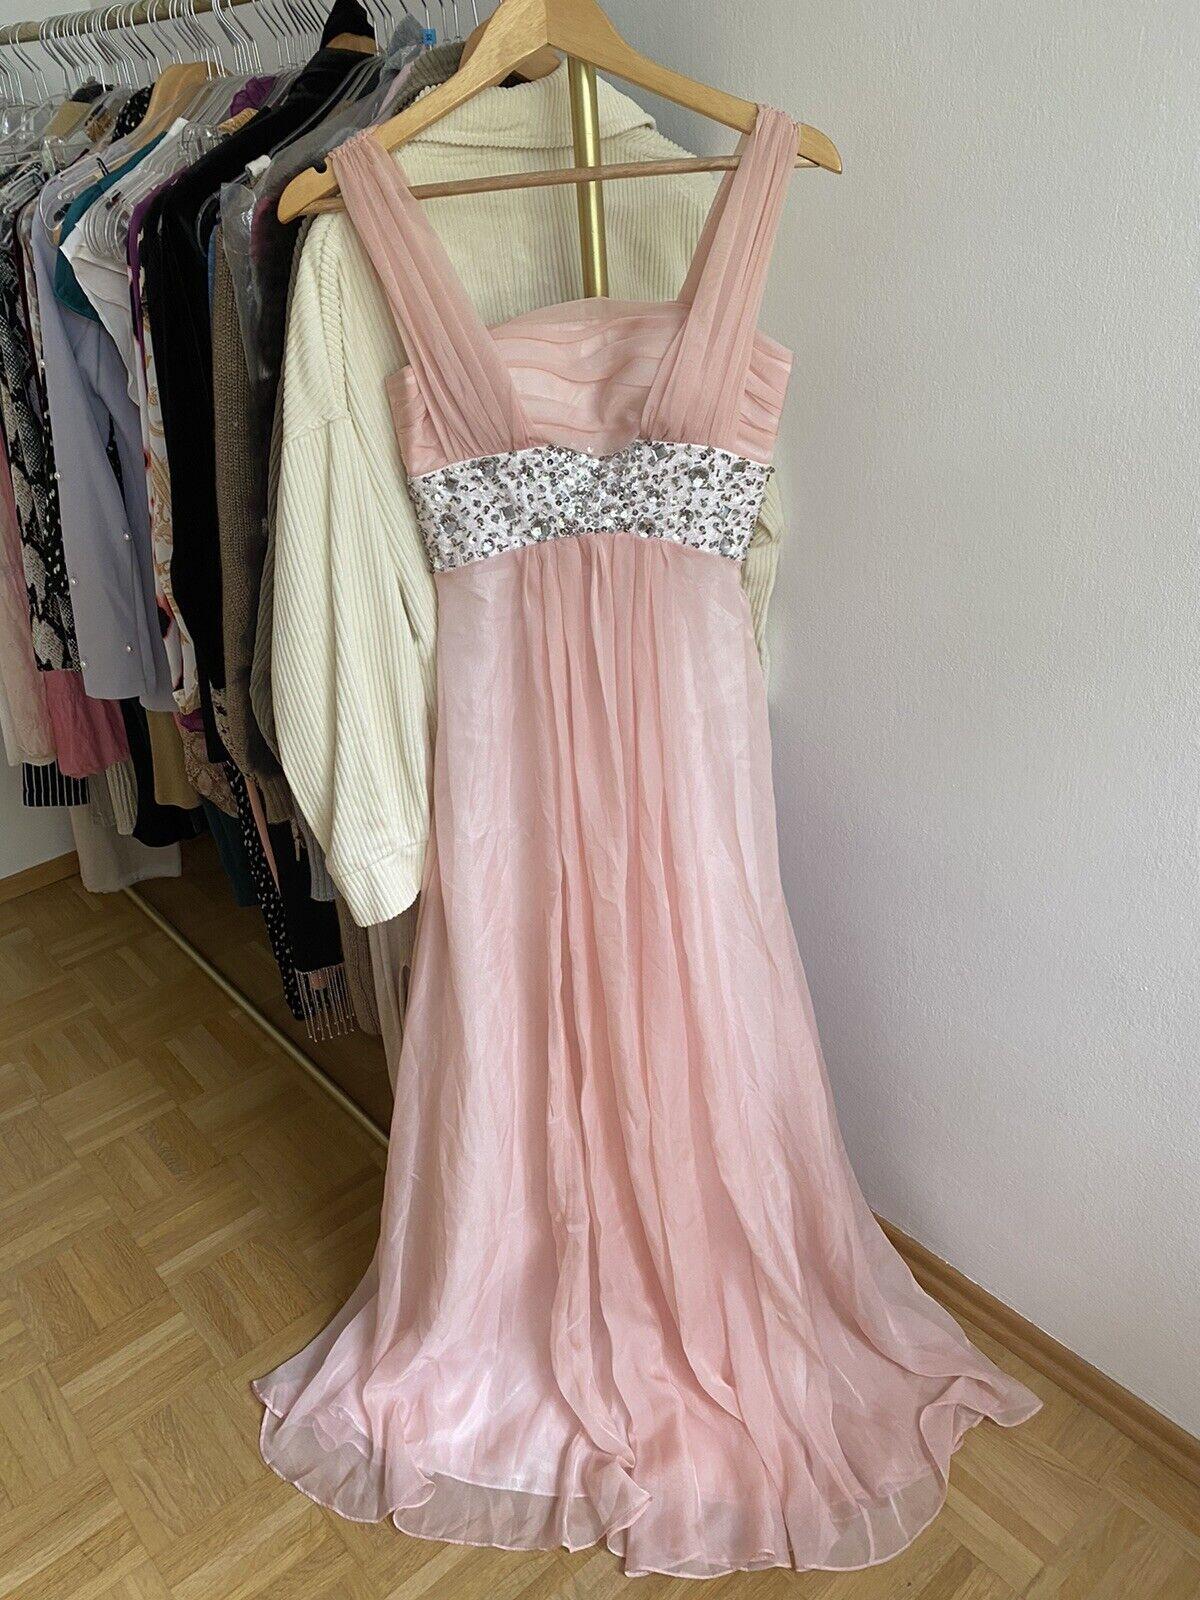 eDressit Abendkleid aus Seide Rosa Prinzessin Kleid XXXS/30